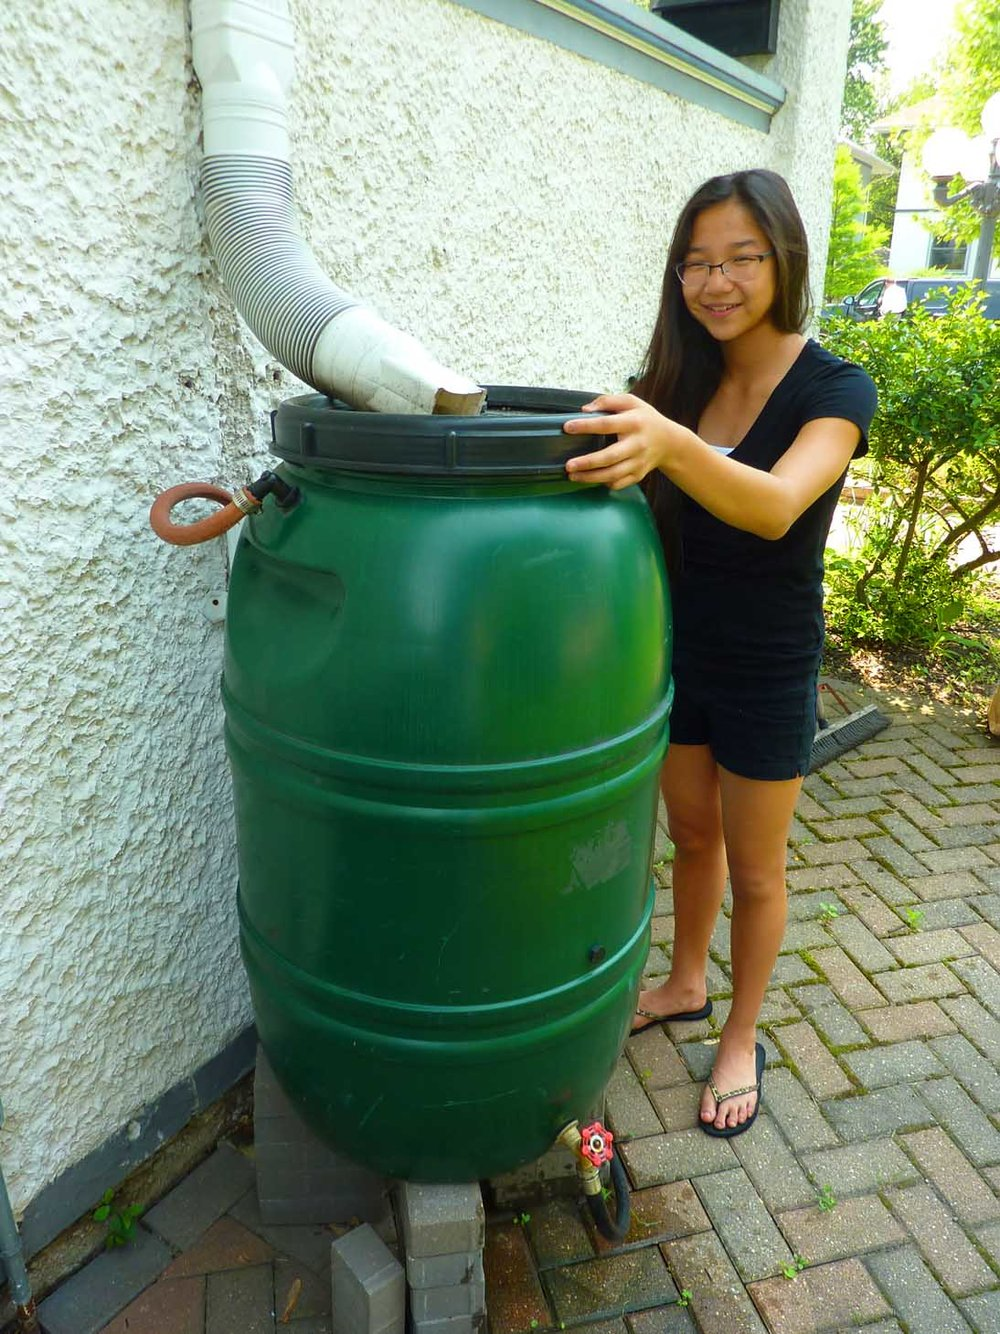 A girl checks her rain barrel.